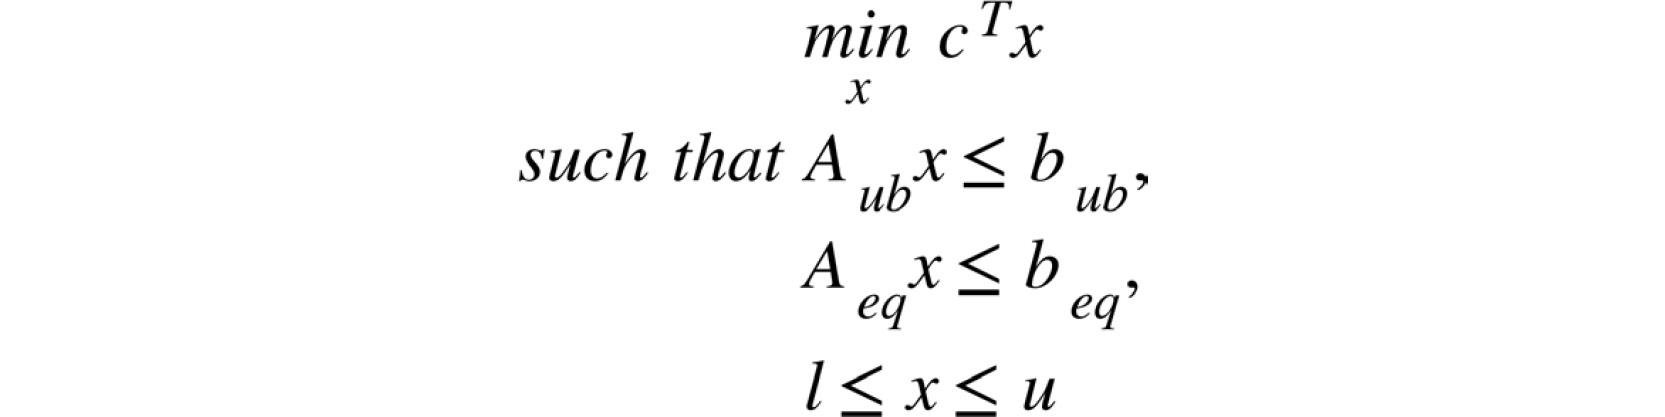 Figure 2.55: Linear programming notation